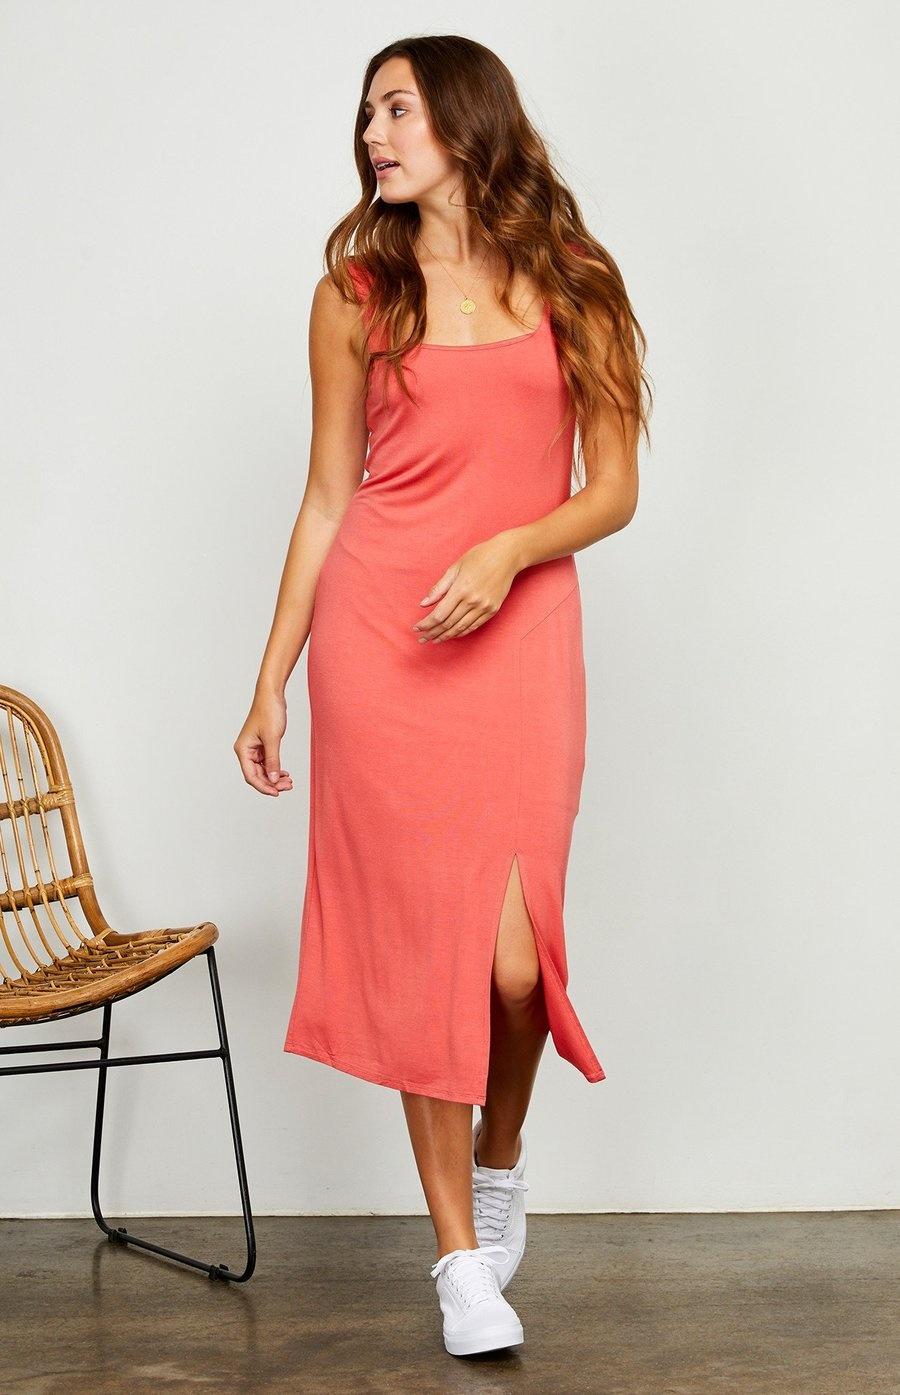 Gentlefawn Avril Dress - Coral